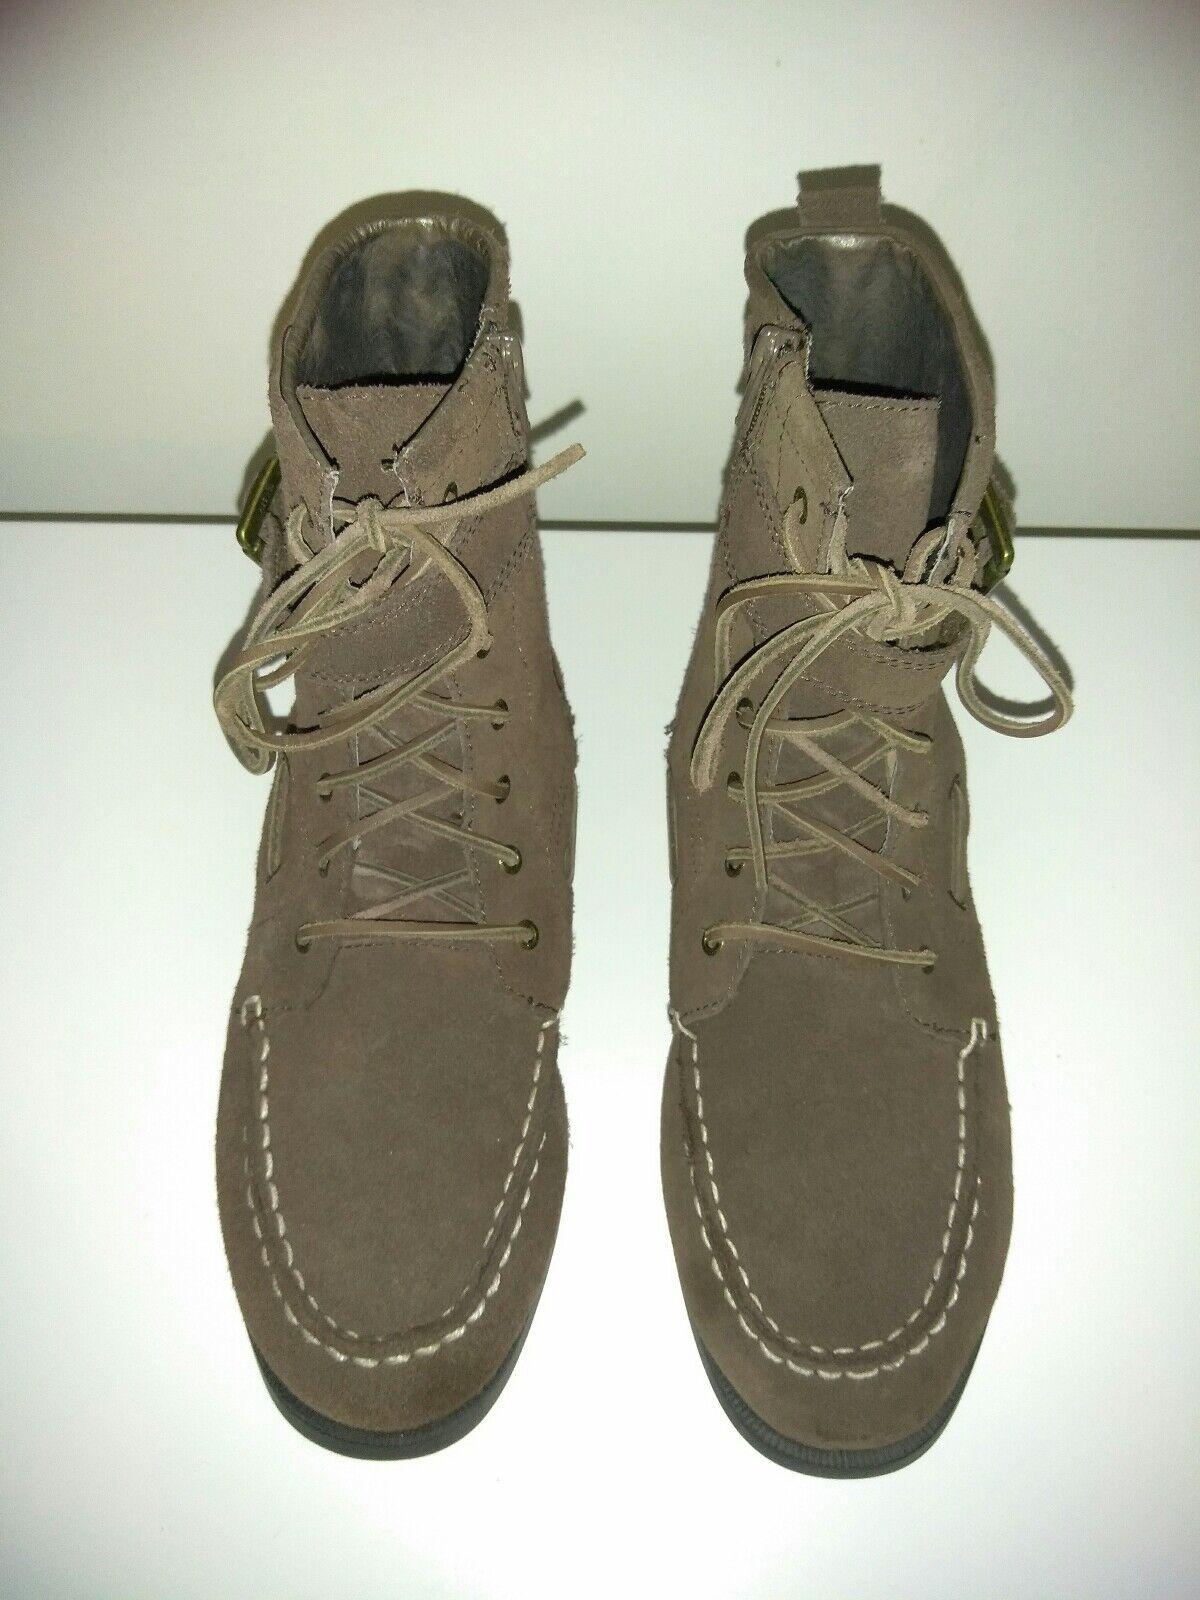 Women's Sperry Top-Sider U.S. Size 7M Brown Suede Starpoint Boots